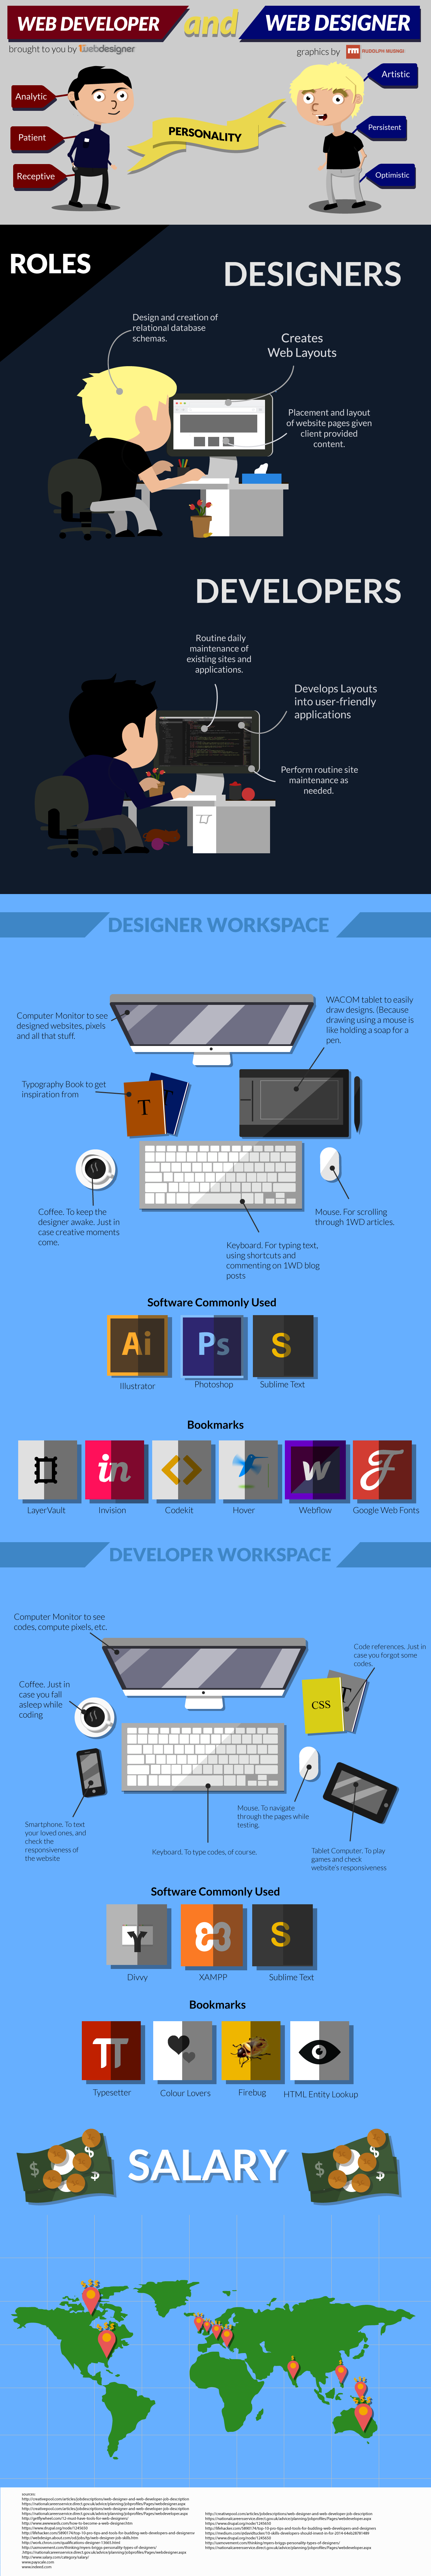 Web Developer Vs Web Designer Infographic Best Infographics Web Development Design Web Design Tips Web Design